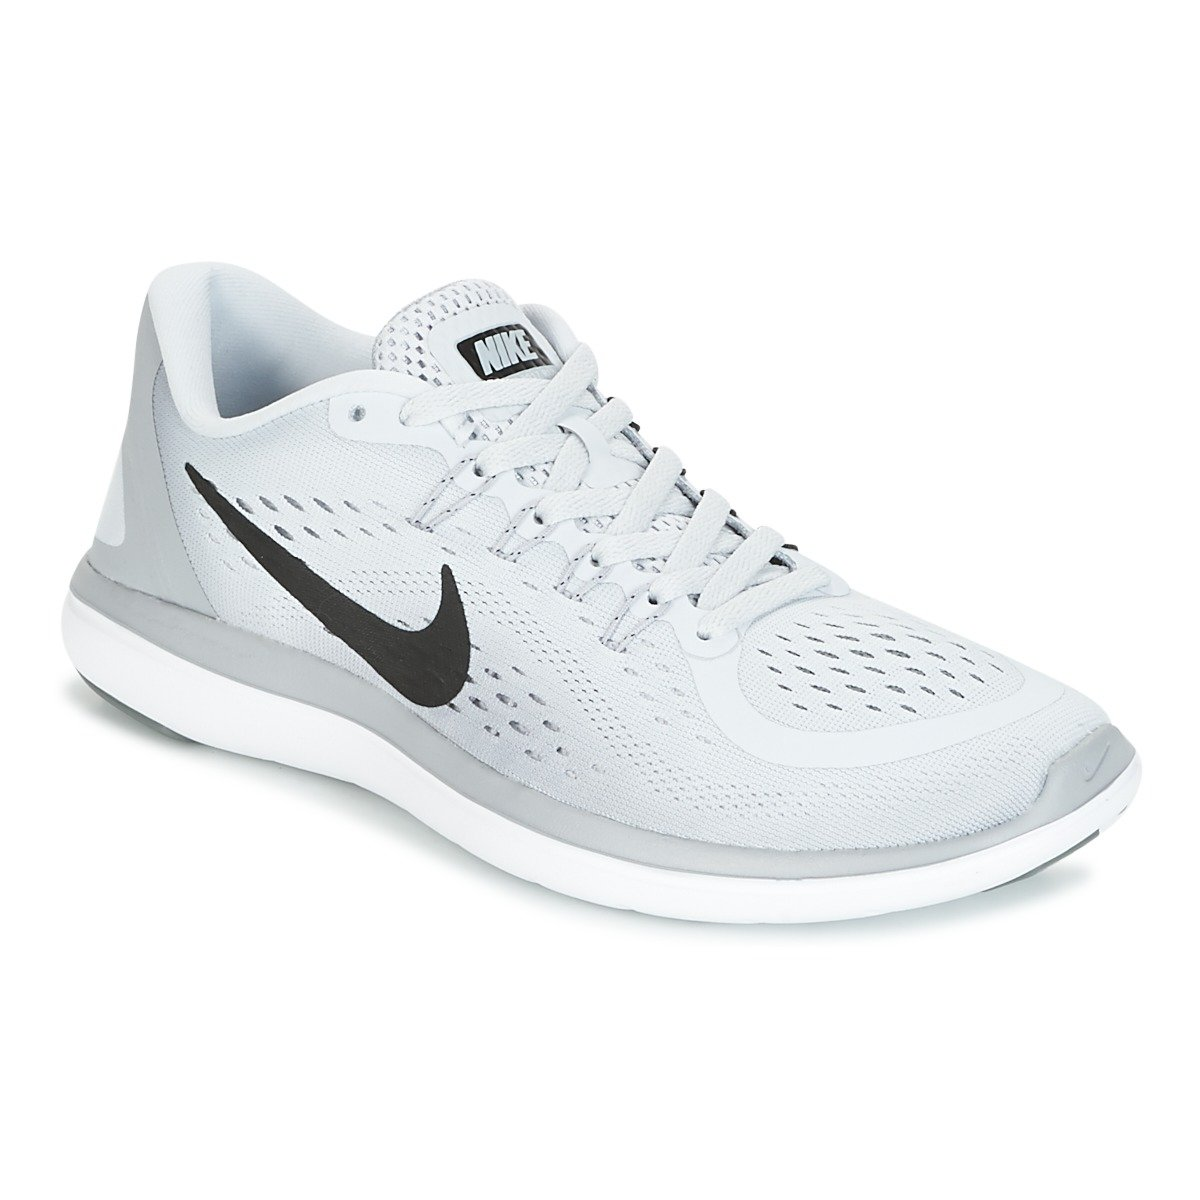 Nike Wmns Flex 2017 RN, Zapatillas de Trail Running para Mujer 44.5 EU|Gris (Pure Platinum / Black / Wolf Grey / Cool Grey 002)